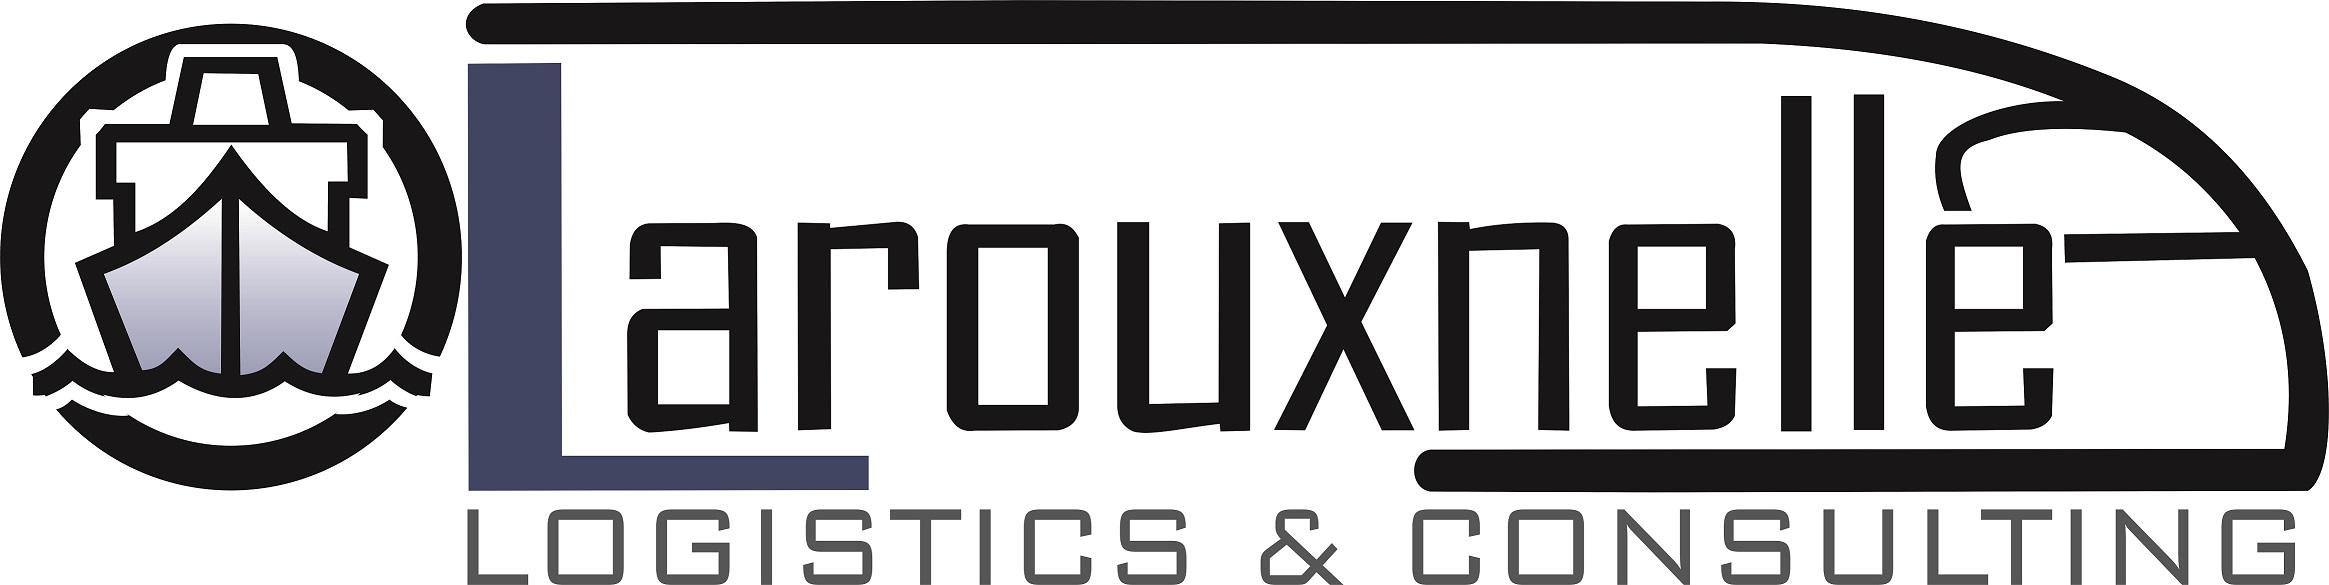 larouxnelle logo 1